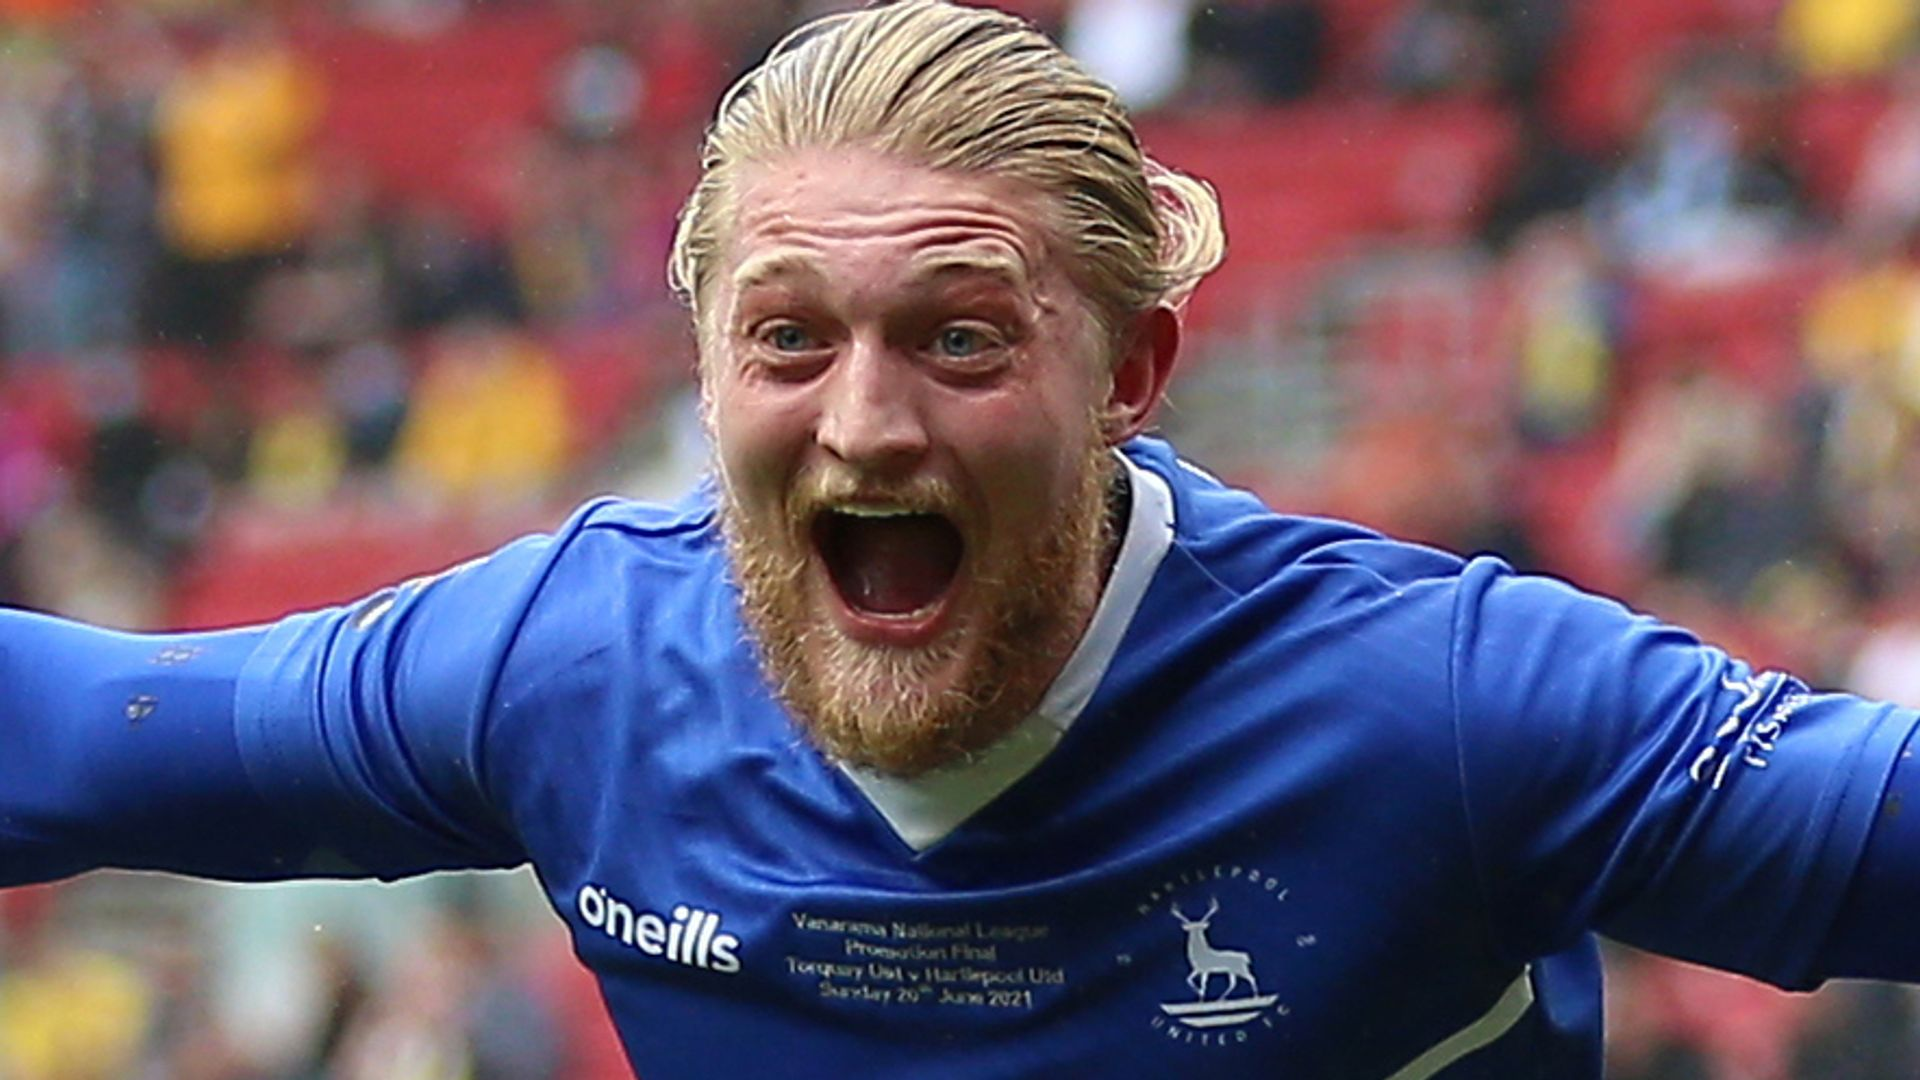 Hartlepool beat Torquay to return to Football League - sky sports